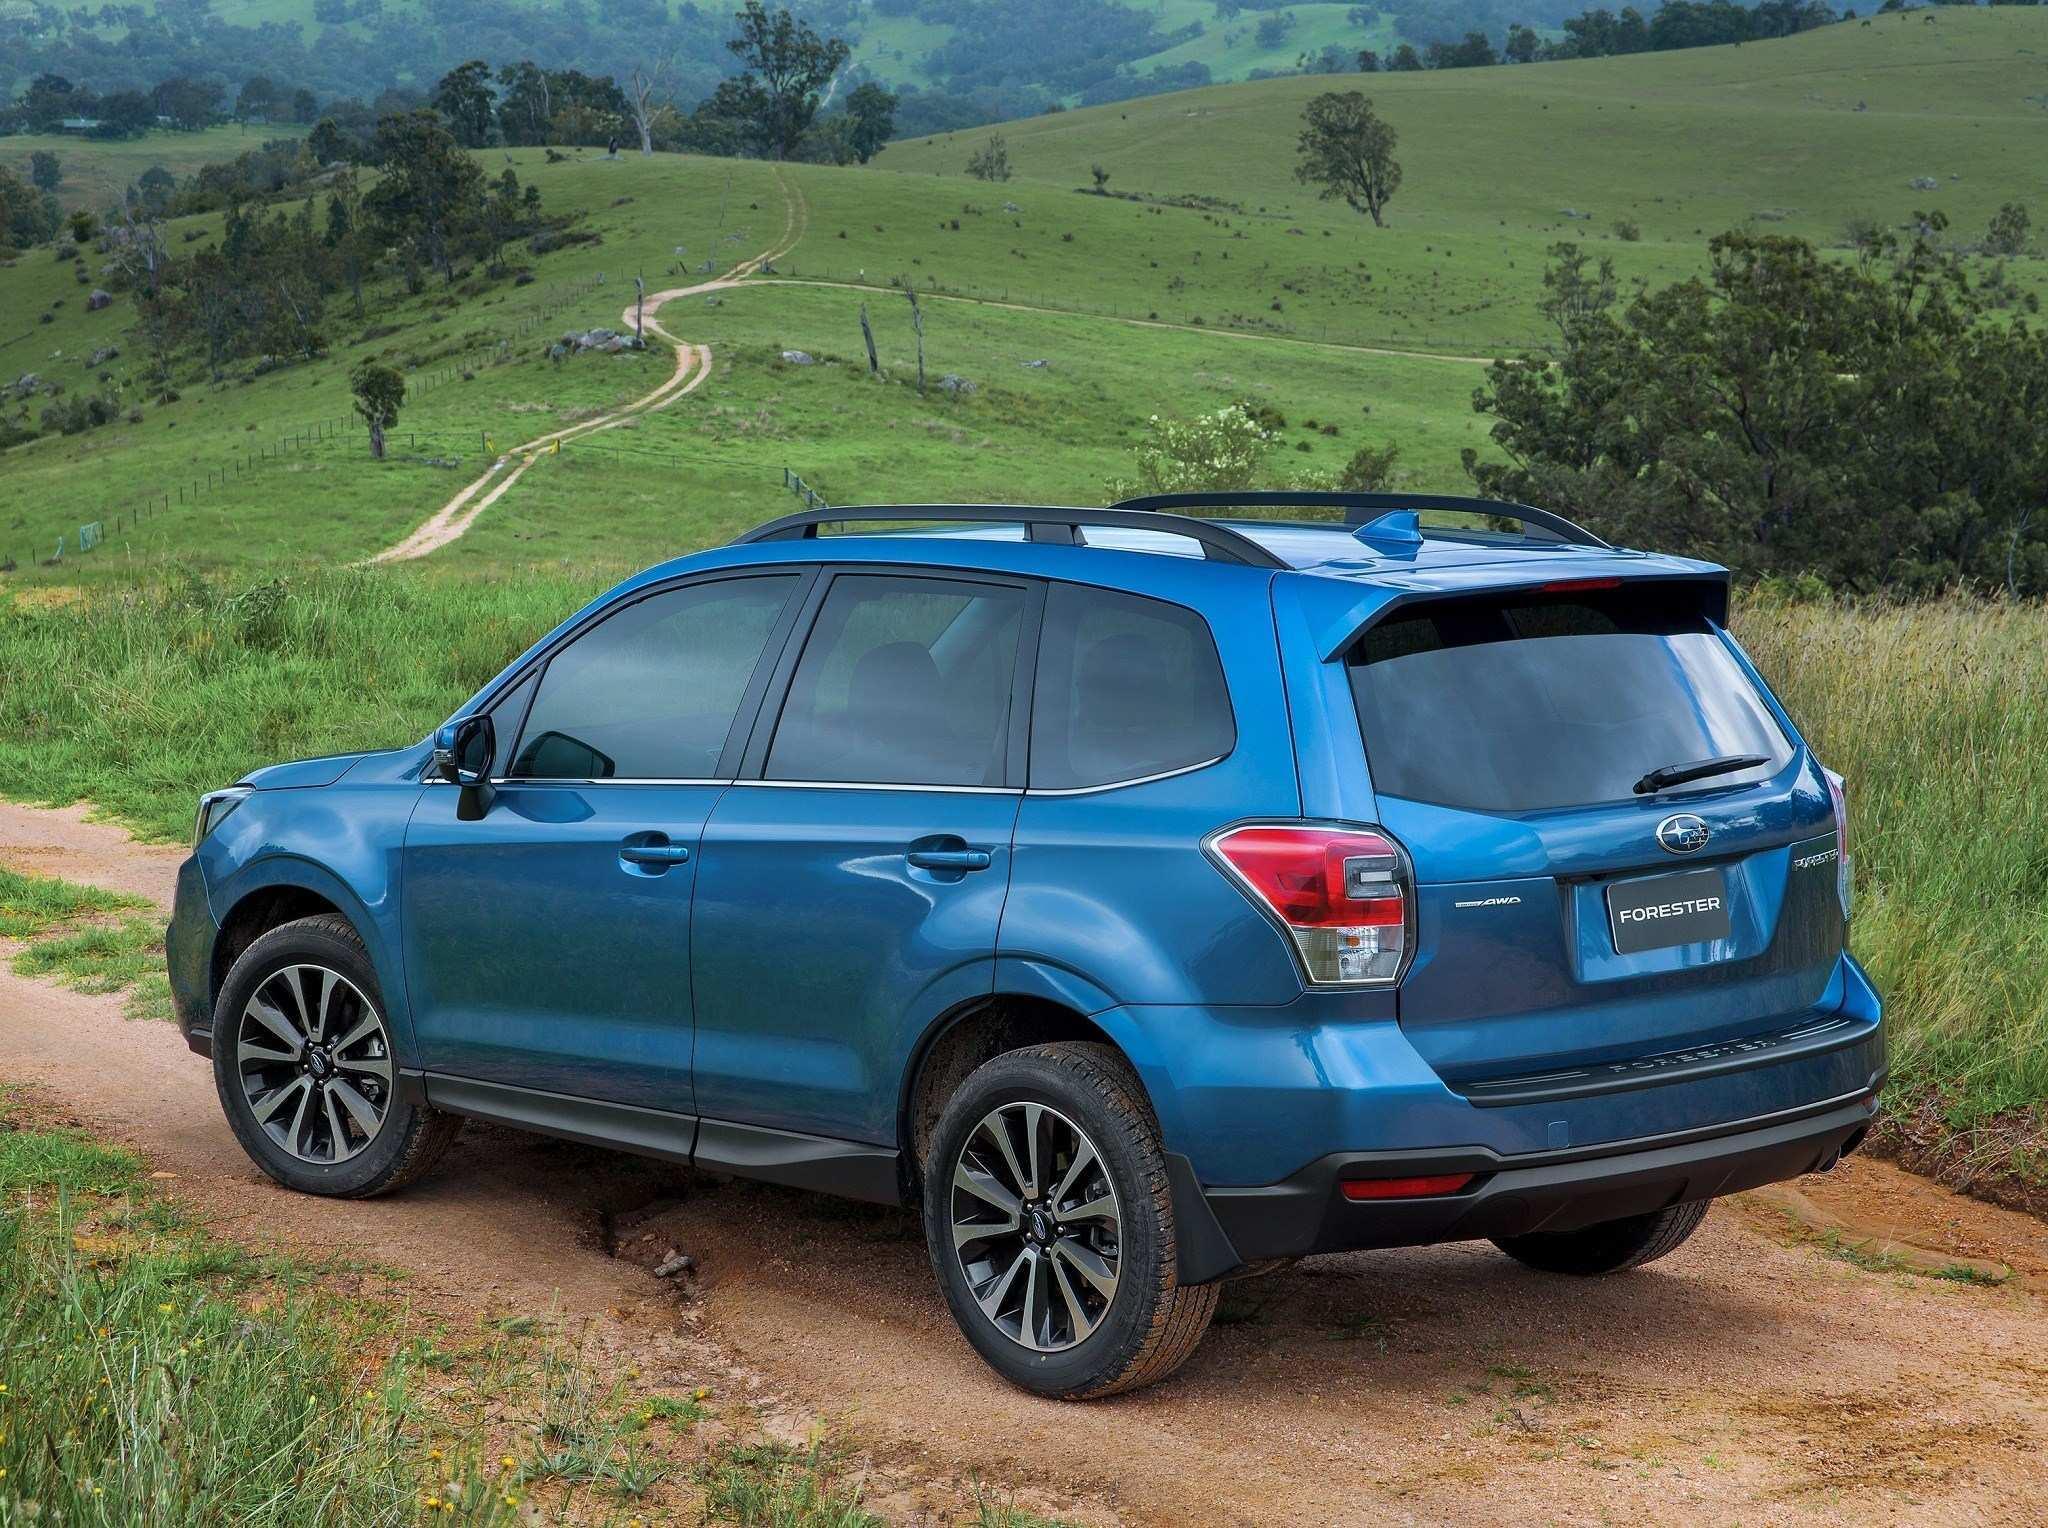 48 Concept of 2020 Subaru Forester Canada Configurations by 2020 Subaru Forester Canada